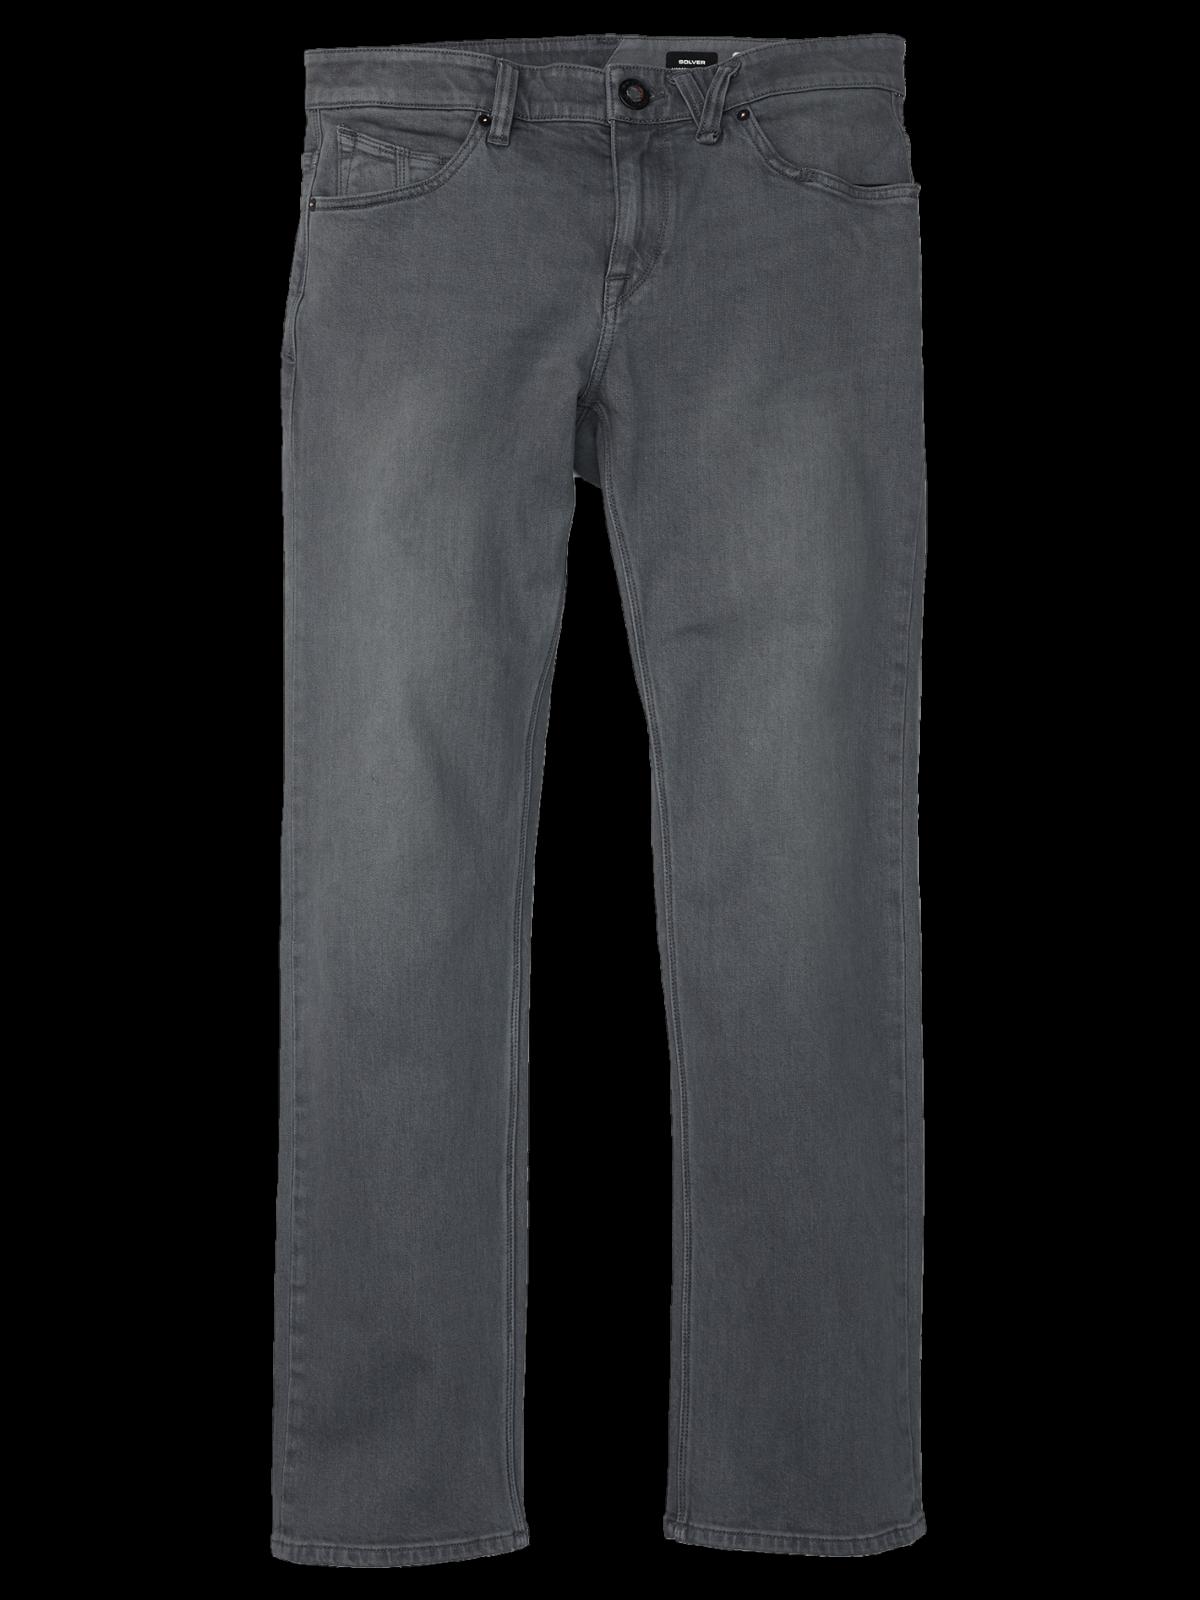 Volcom Solver Denim Grey Vintage